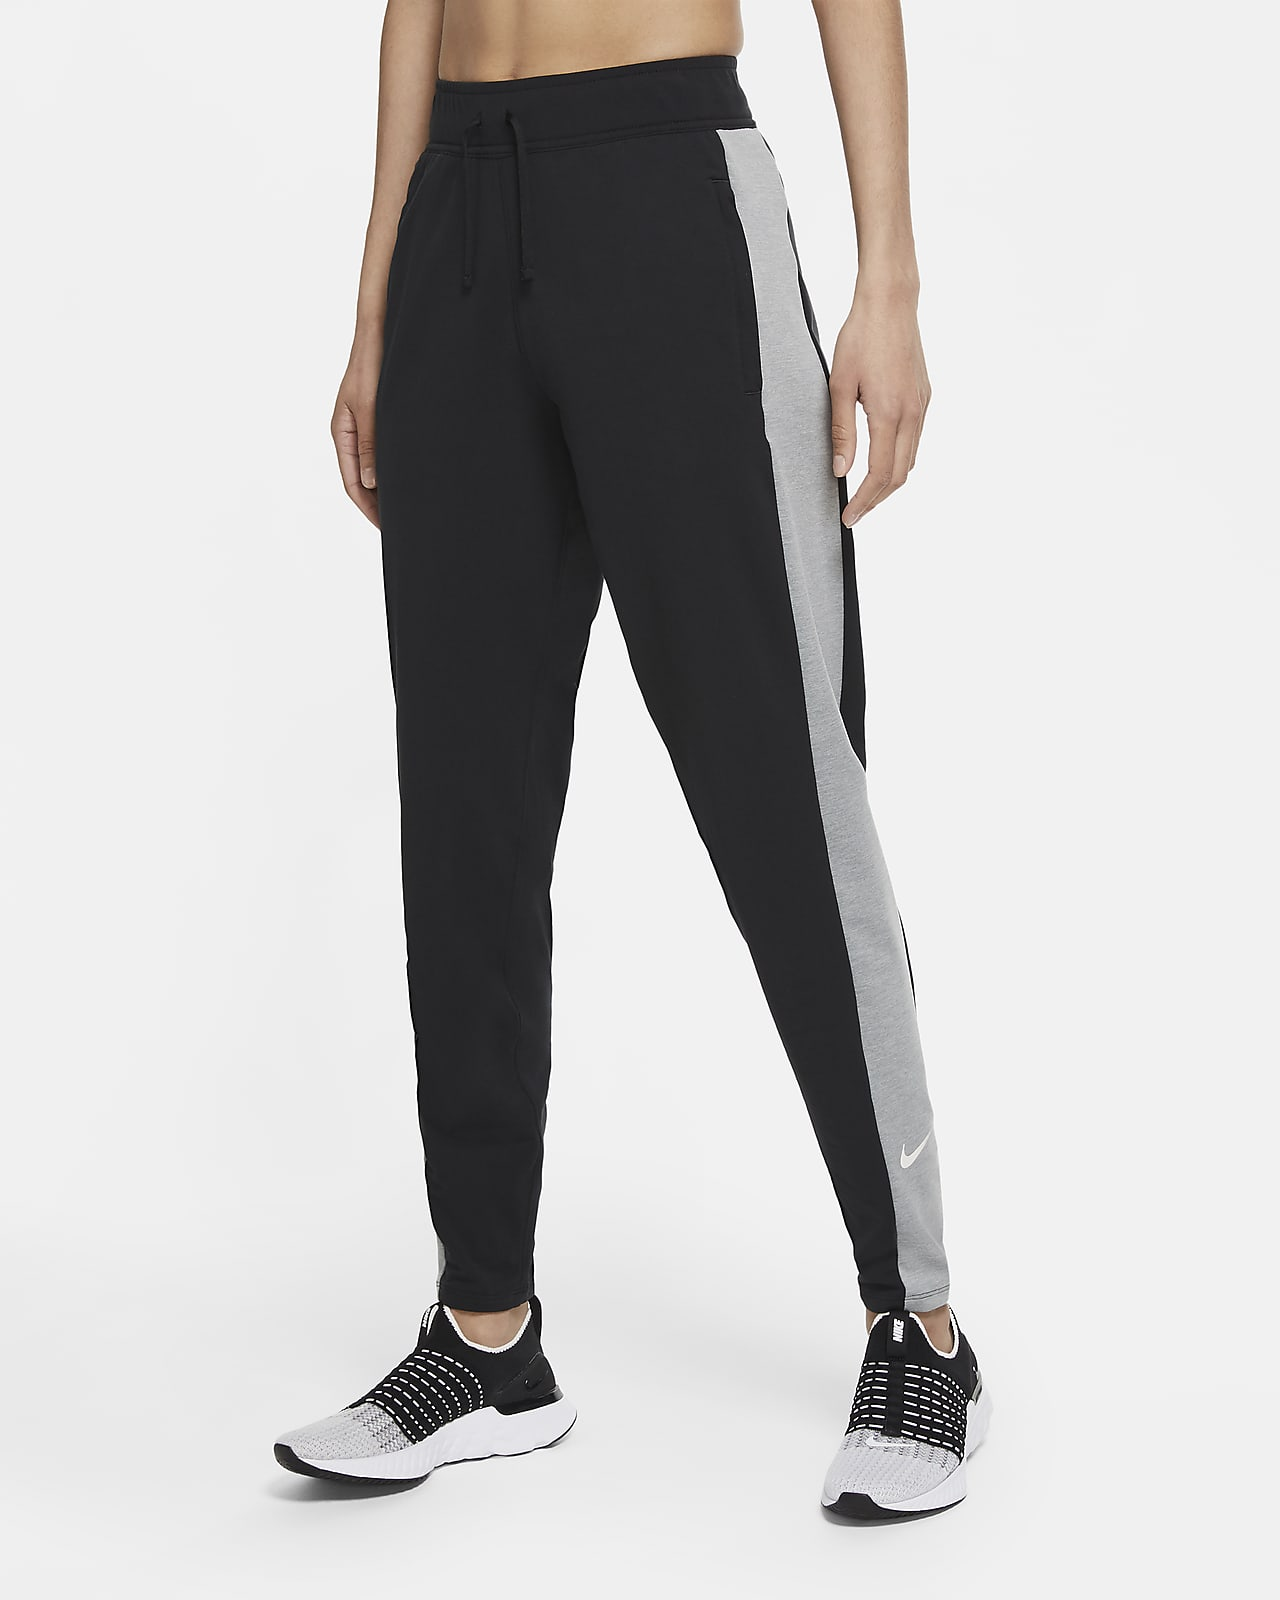 Nike Essential Warm Women's Running Trousers